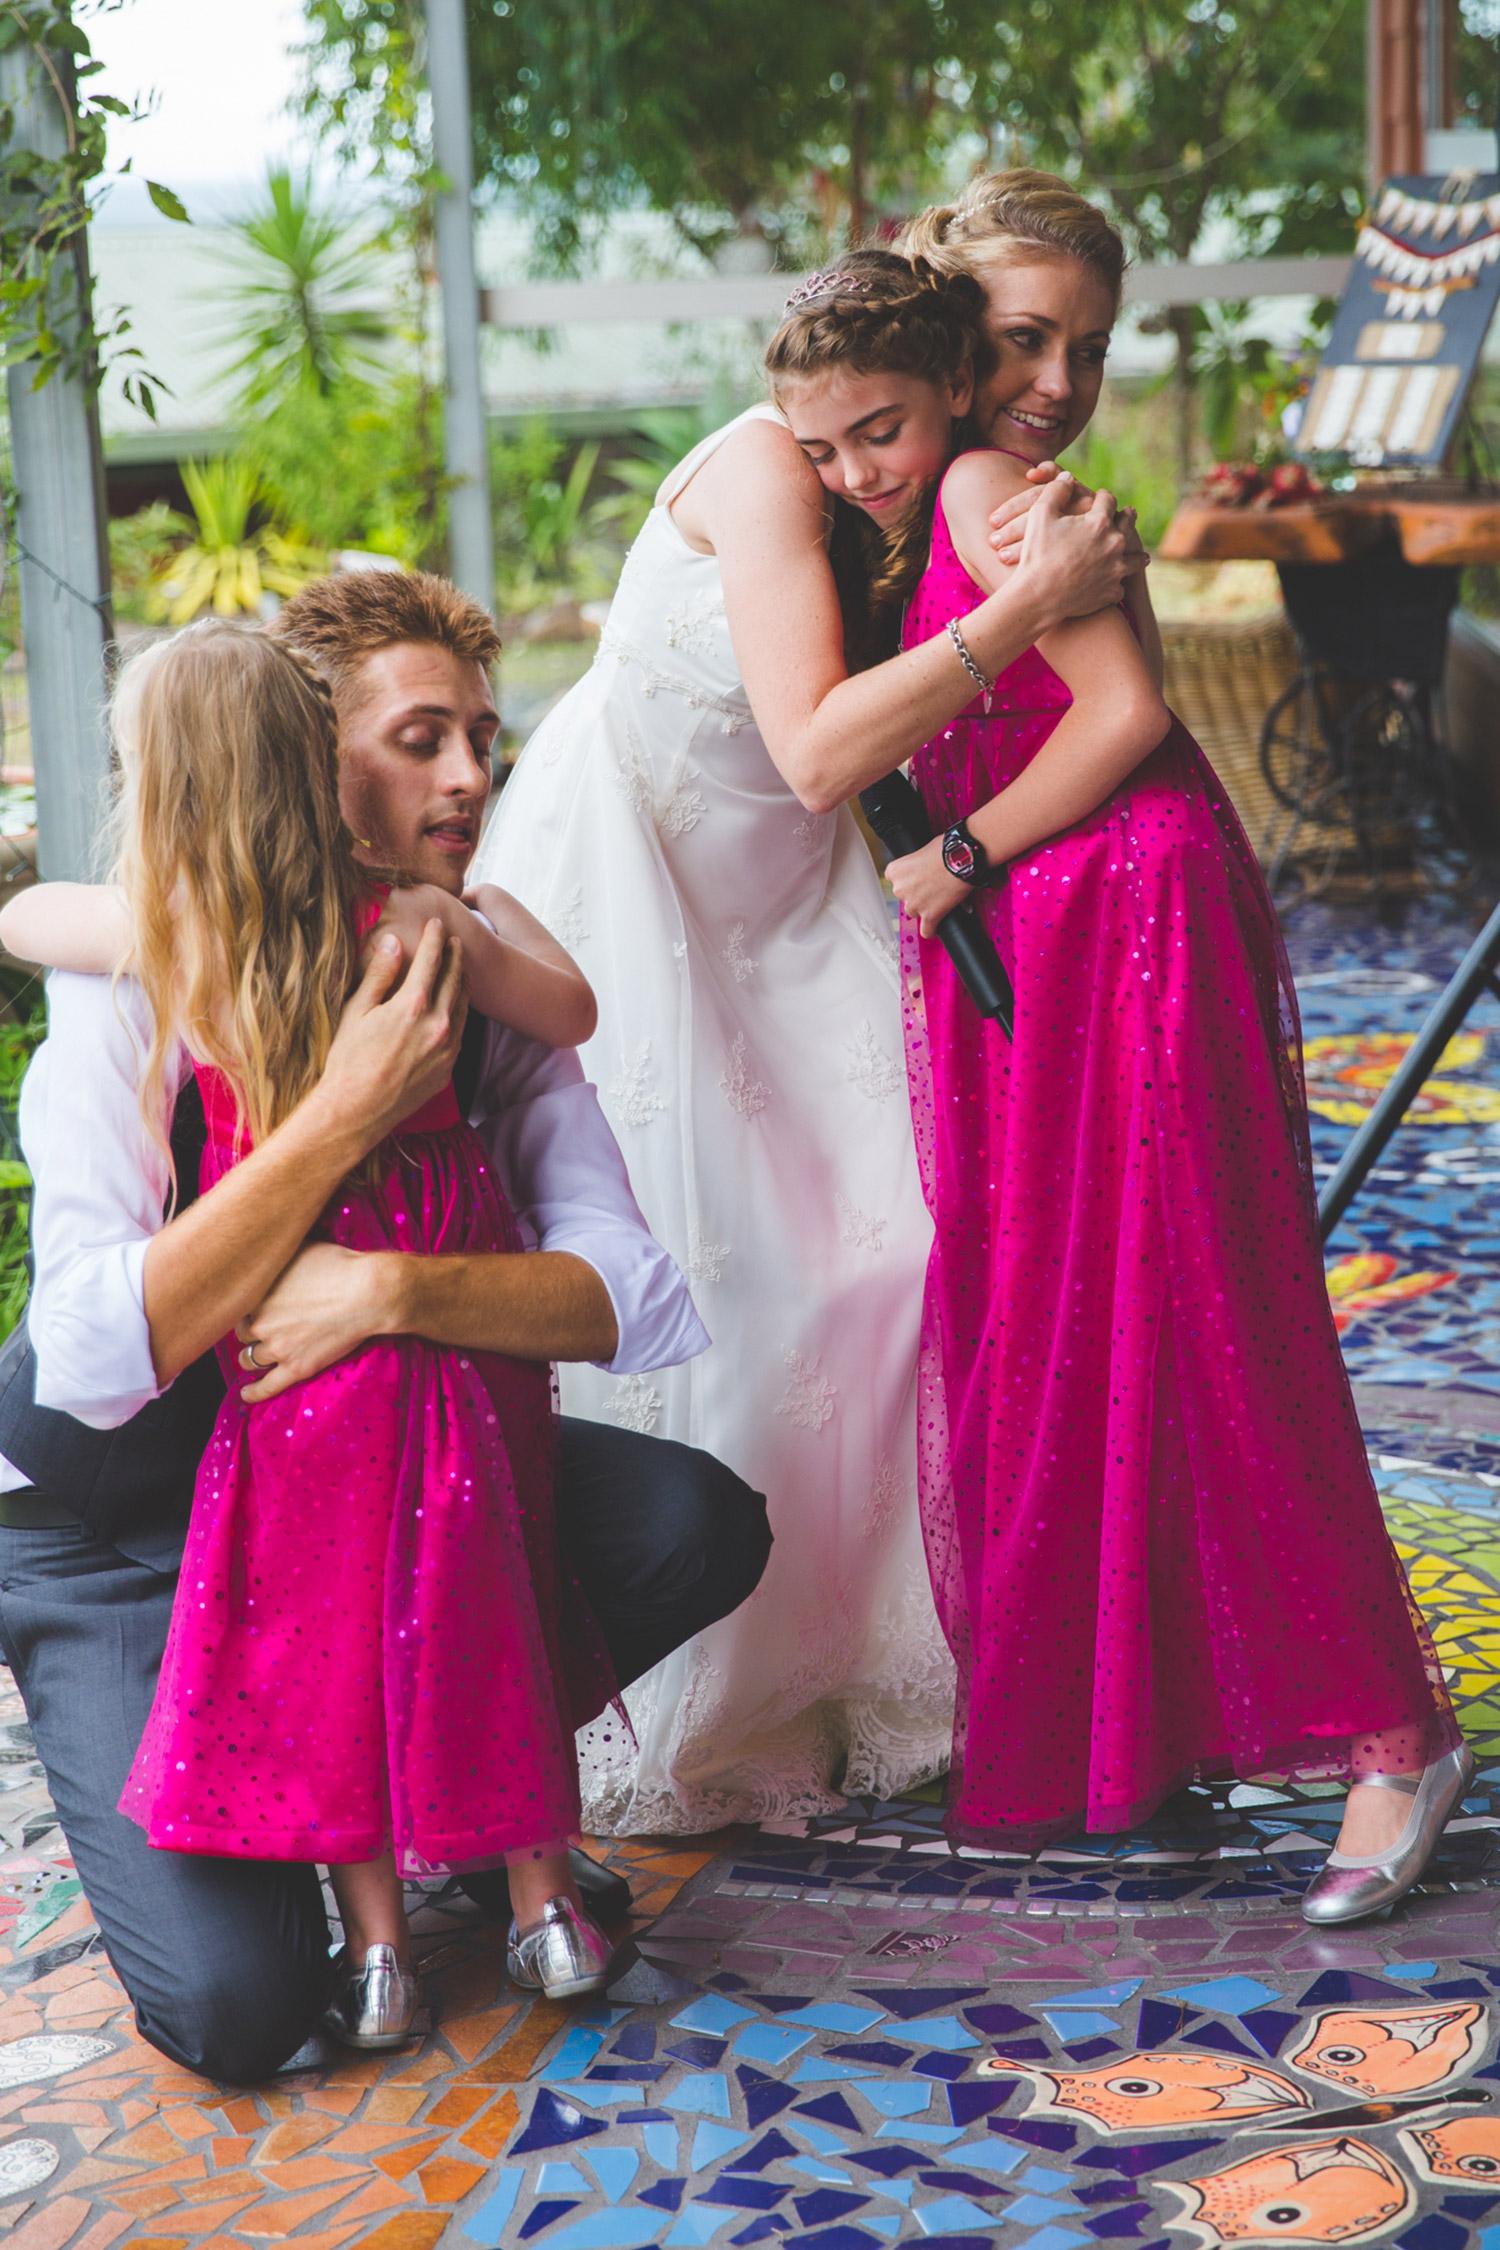 72-sunshine-coast-wedding-photography-all-the-love-in-the-world-noosa-mooloolaba-glasshouse-brisbane-katie-ryan7687.jpg